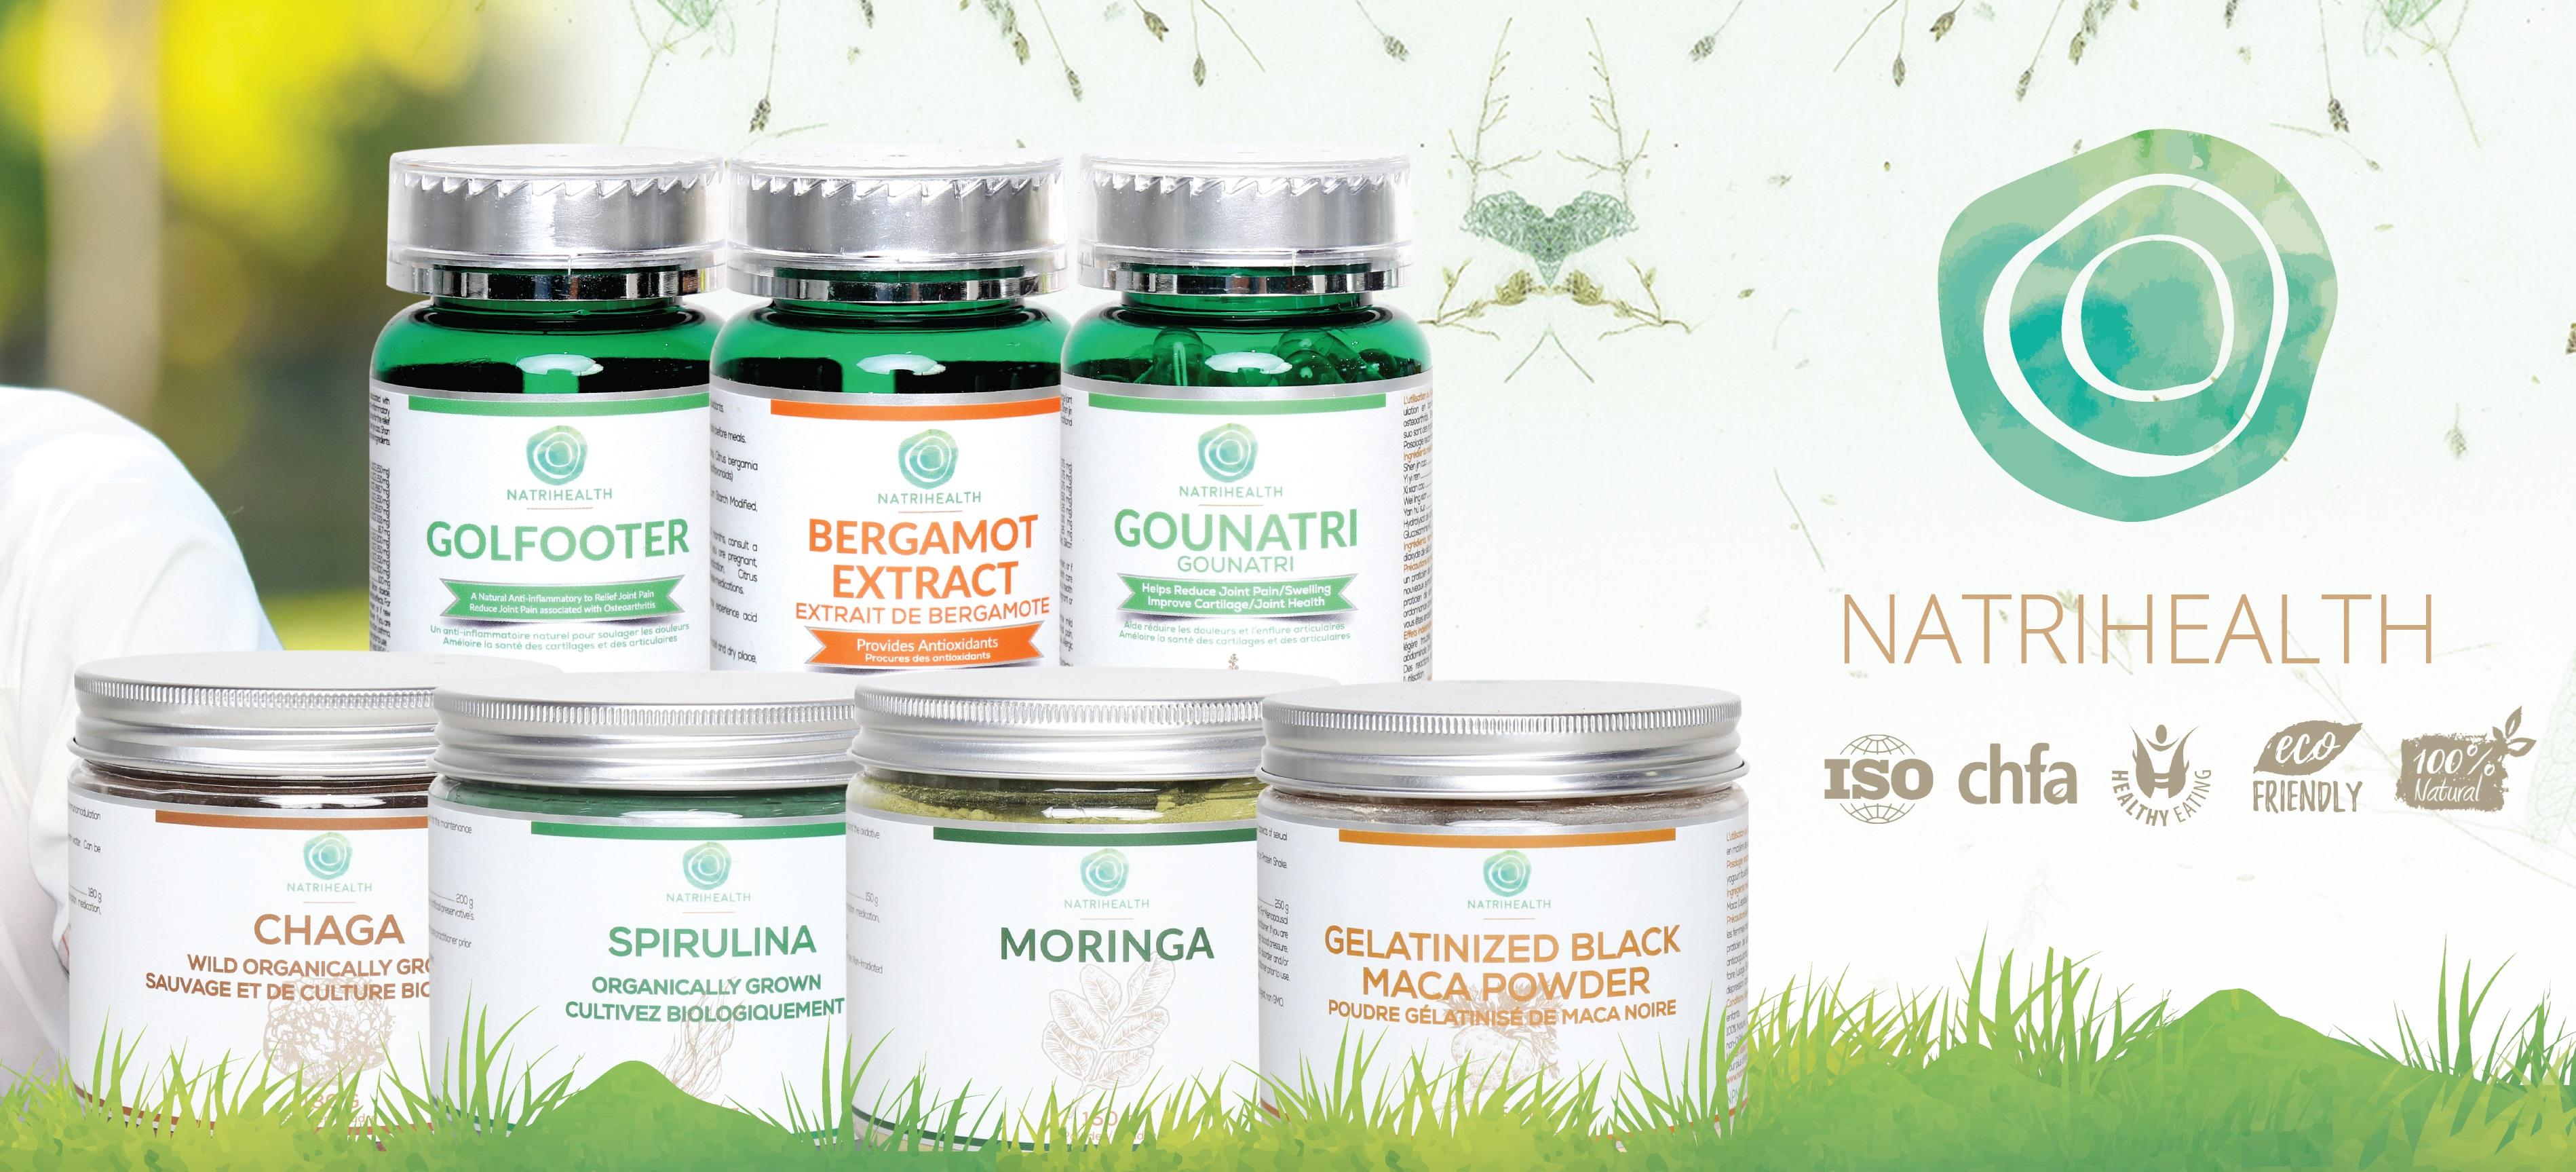 BUY Vitamins and Health Supplements, Natrihealth, Ddrops, New Chapter, Webber, Nordic, online at LOTUSmart (HK) Hong Kong